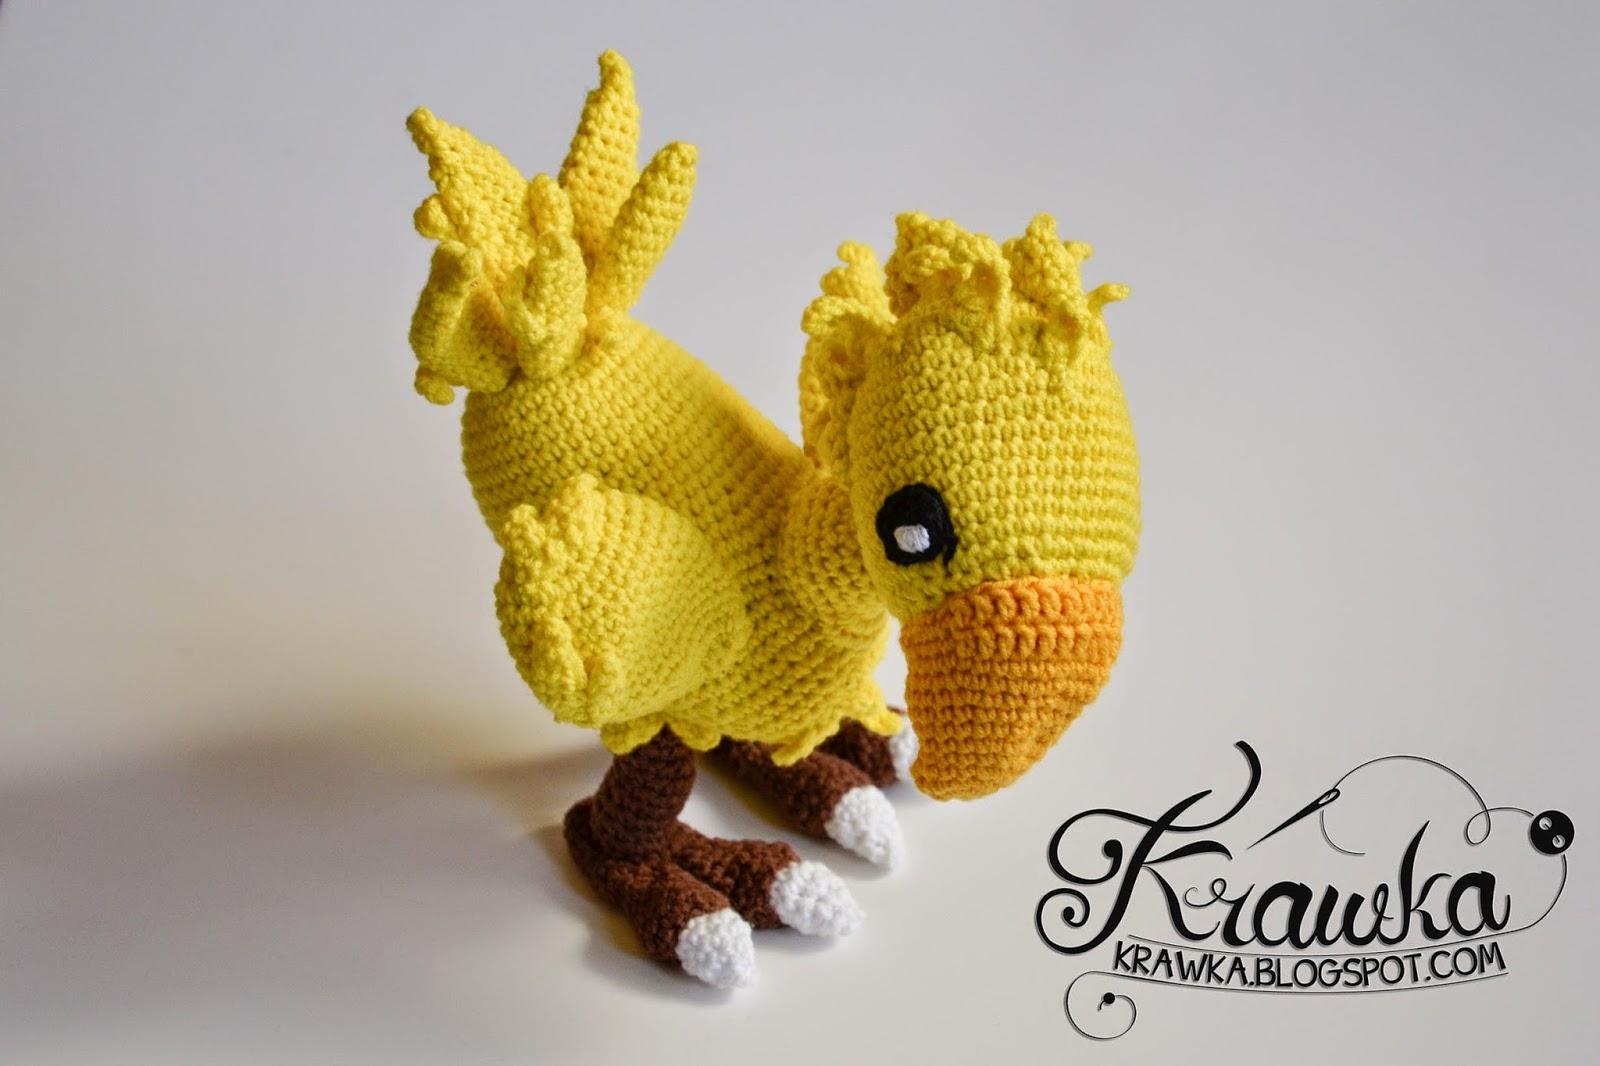 Krawka: Chocobo from Final Fantasy - crochet plush, wired inside - fully adjustable.